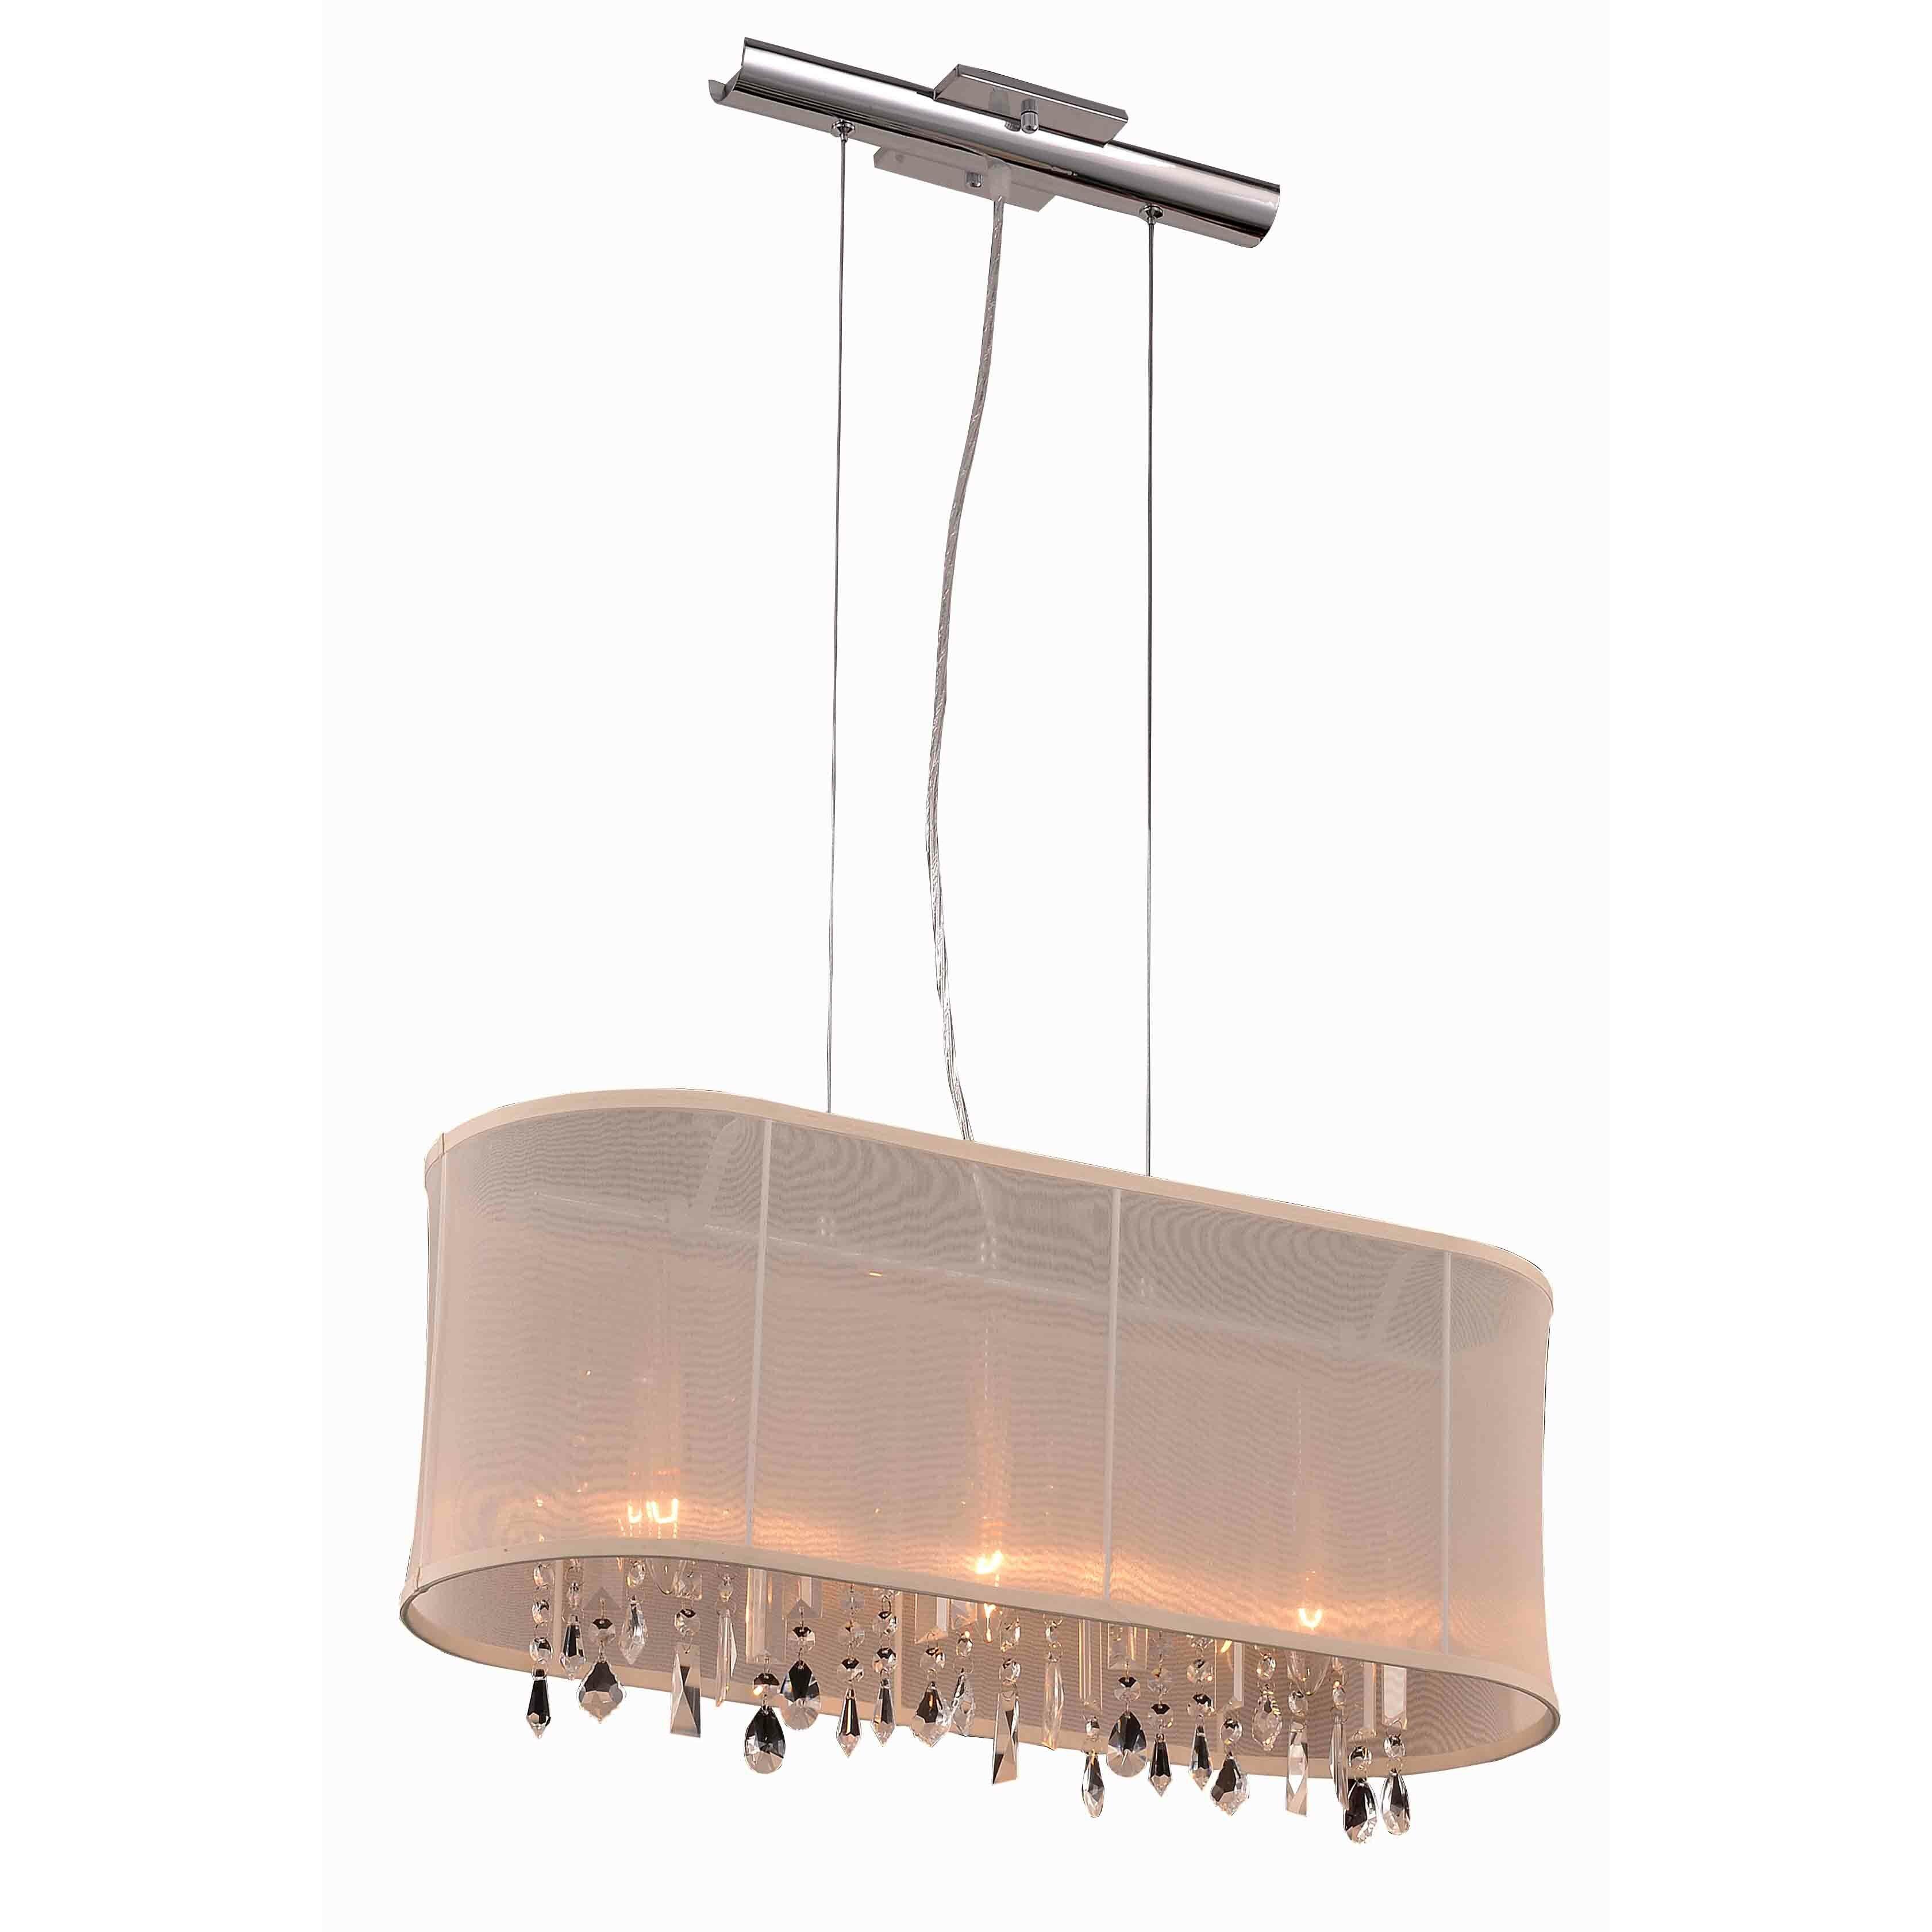 Wildon home harmony 3 light kitchen island pendant wayfair for 3 light pendant island kitchen lighting